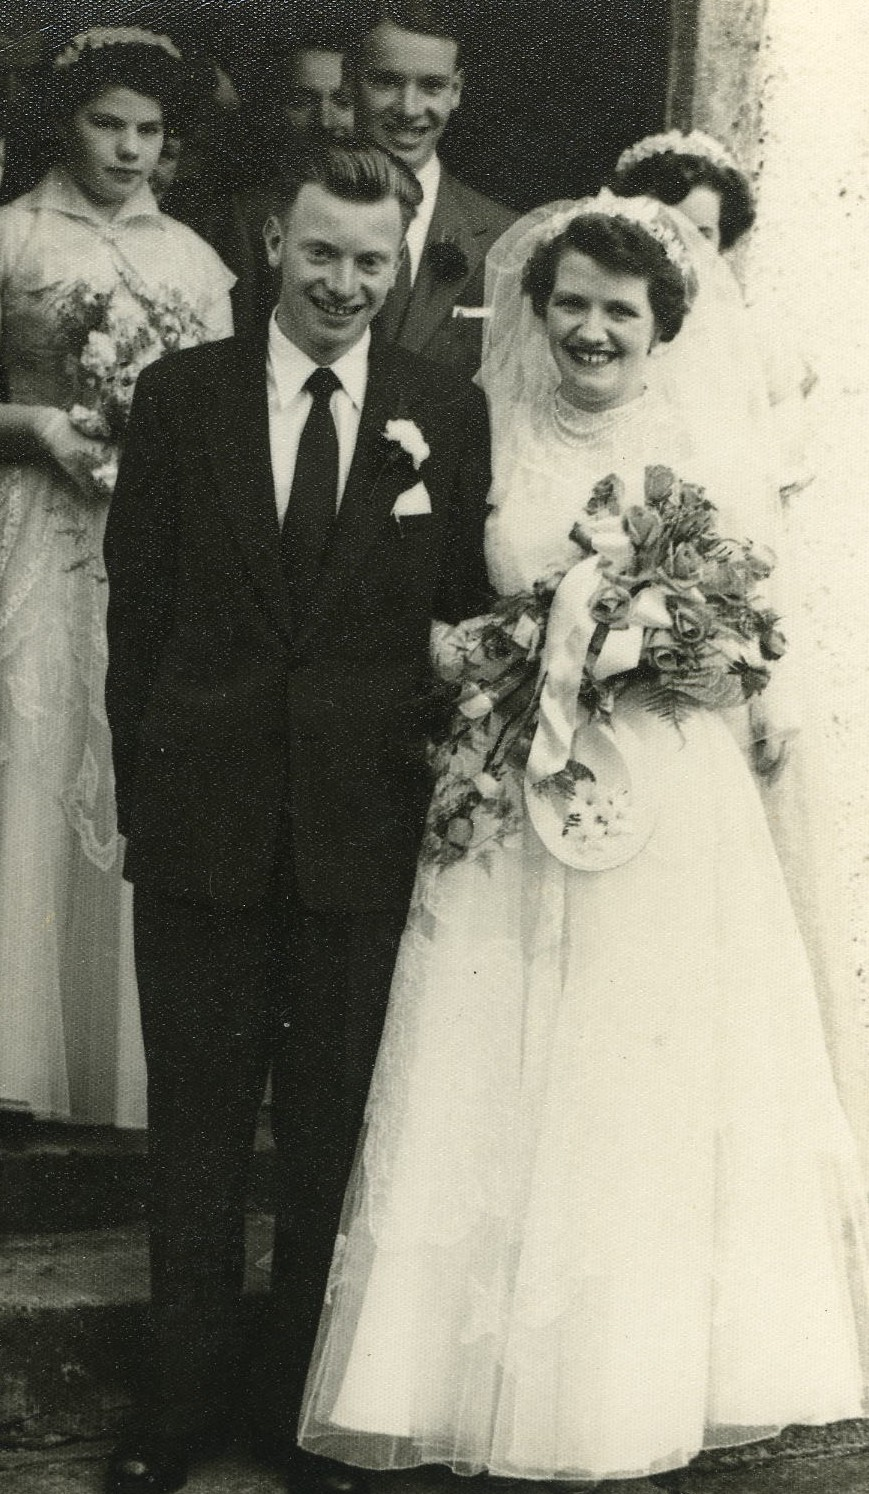 Nigel Callander & Janet MacCallum's Wedding